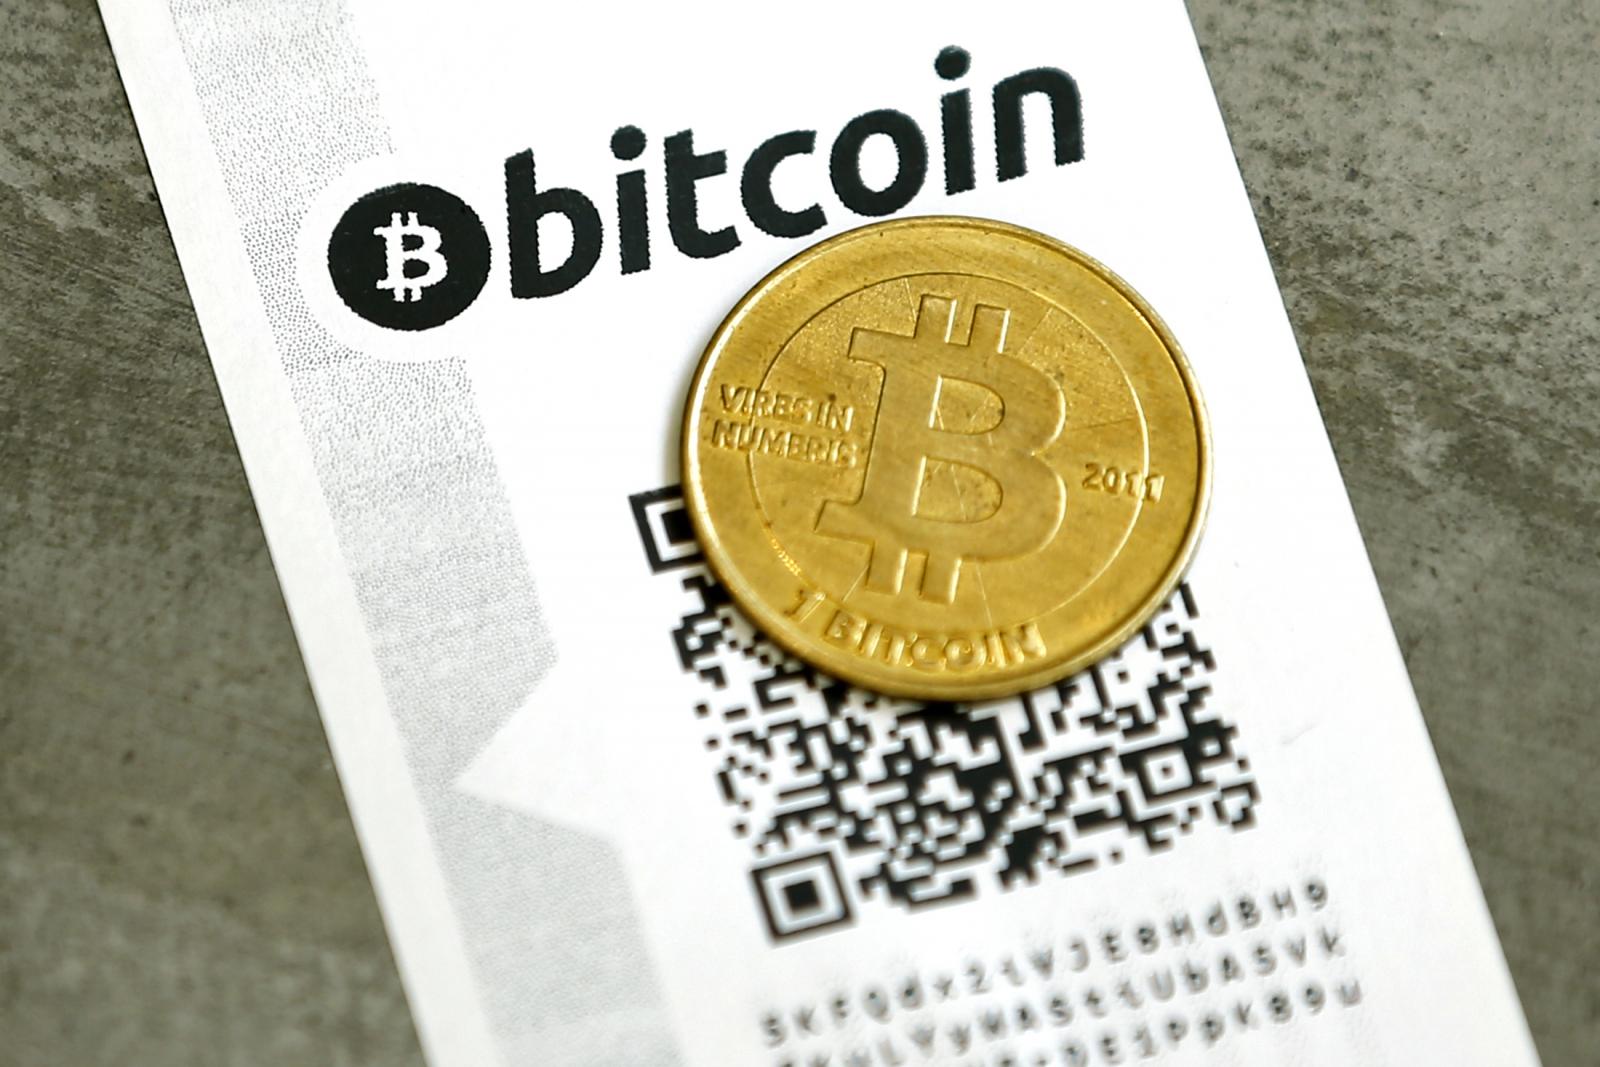 Man throws hard drive away with bitcoins mauro betting carta pai bertindih